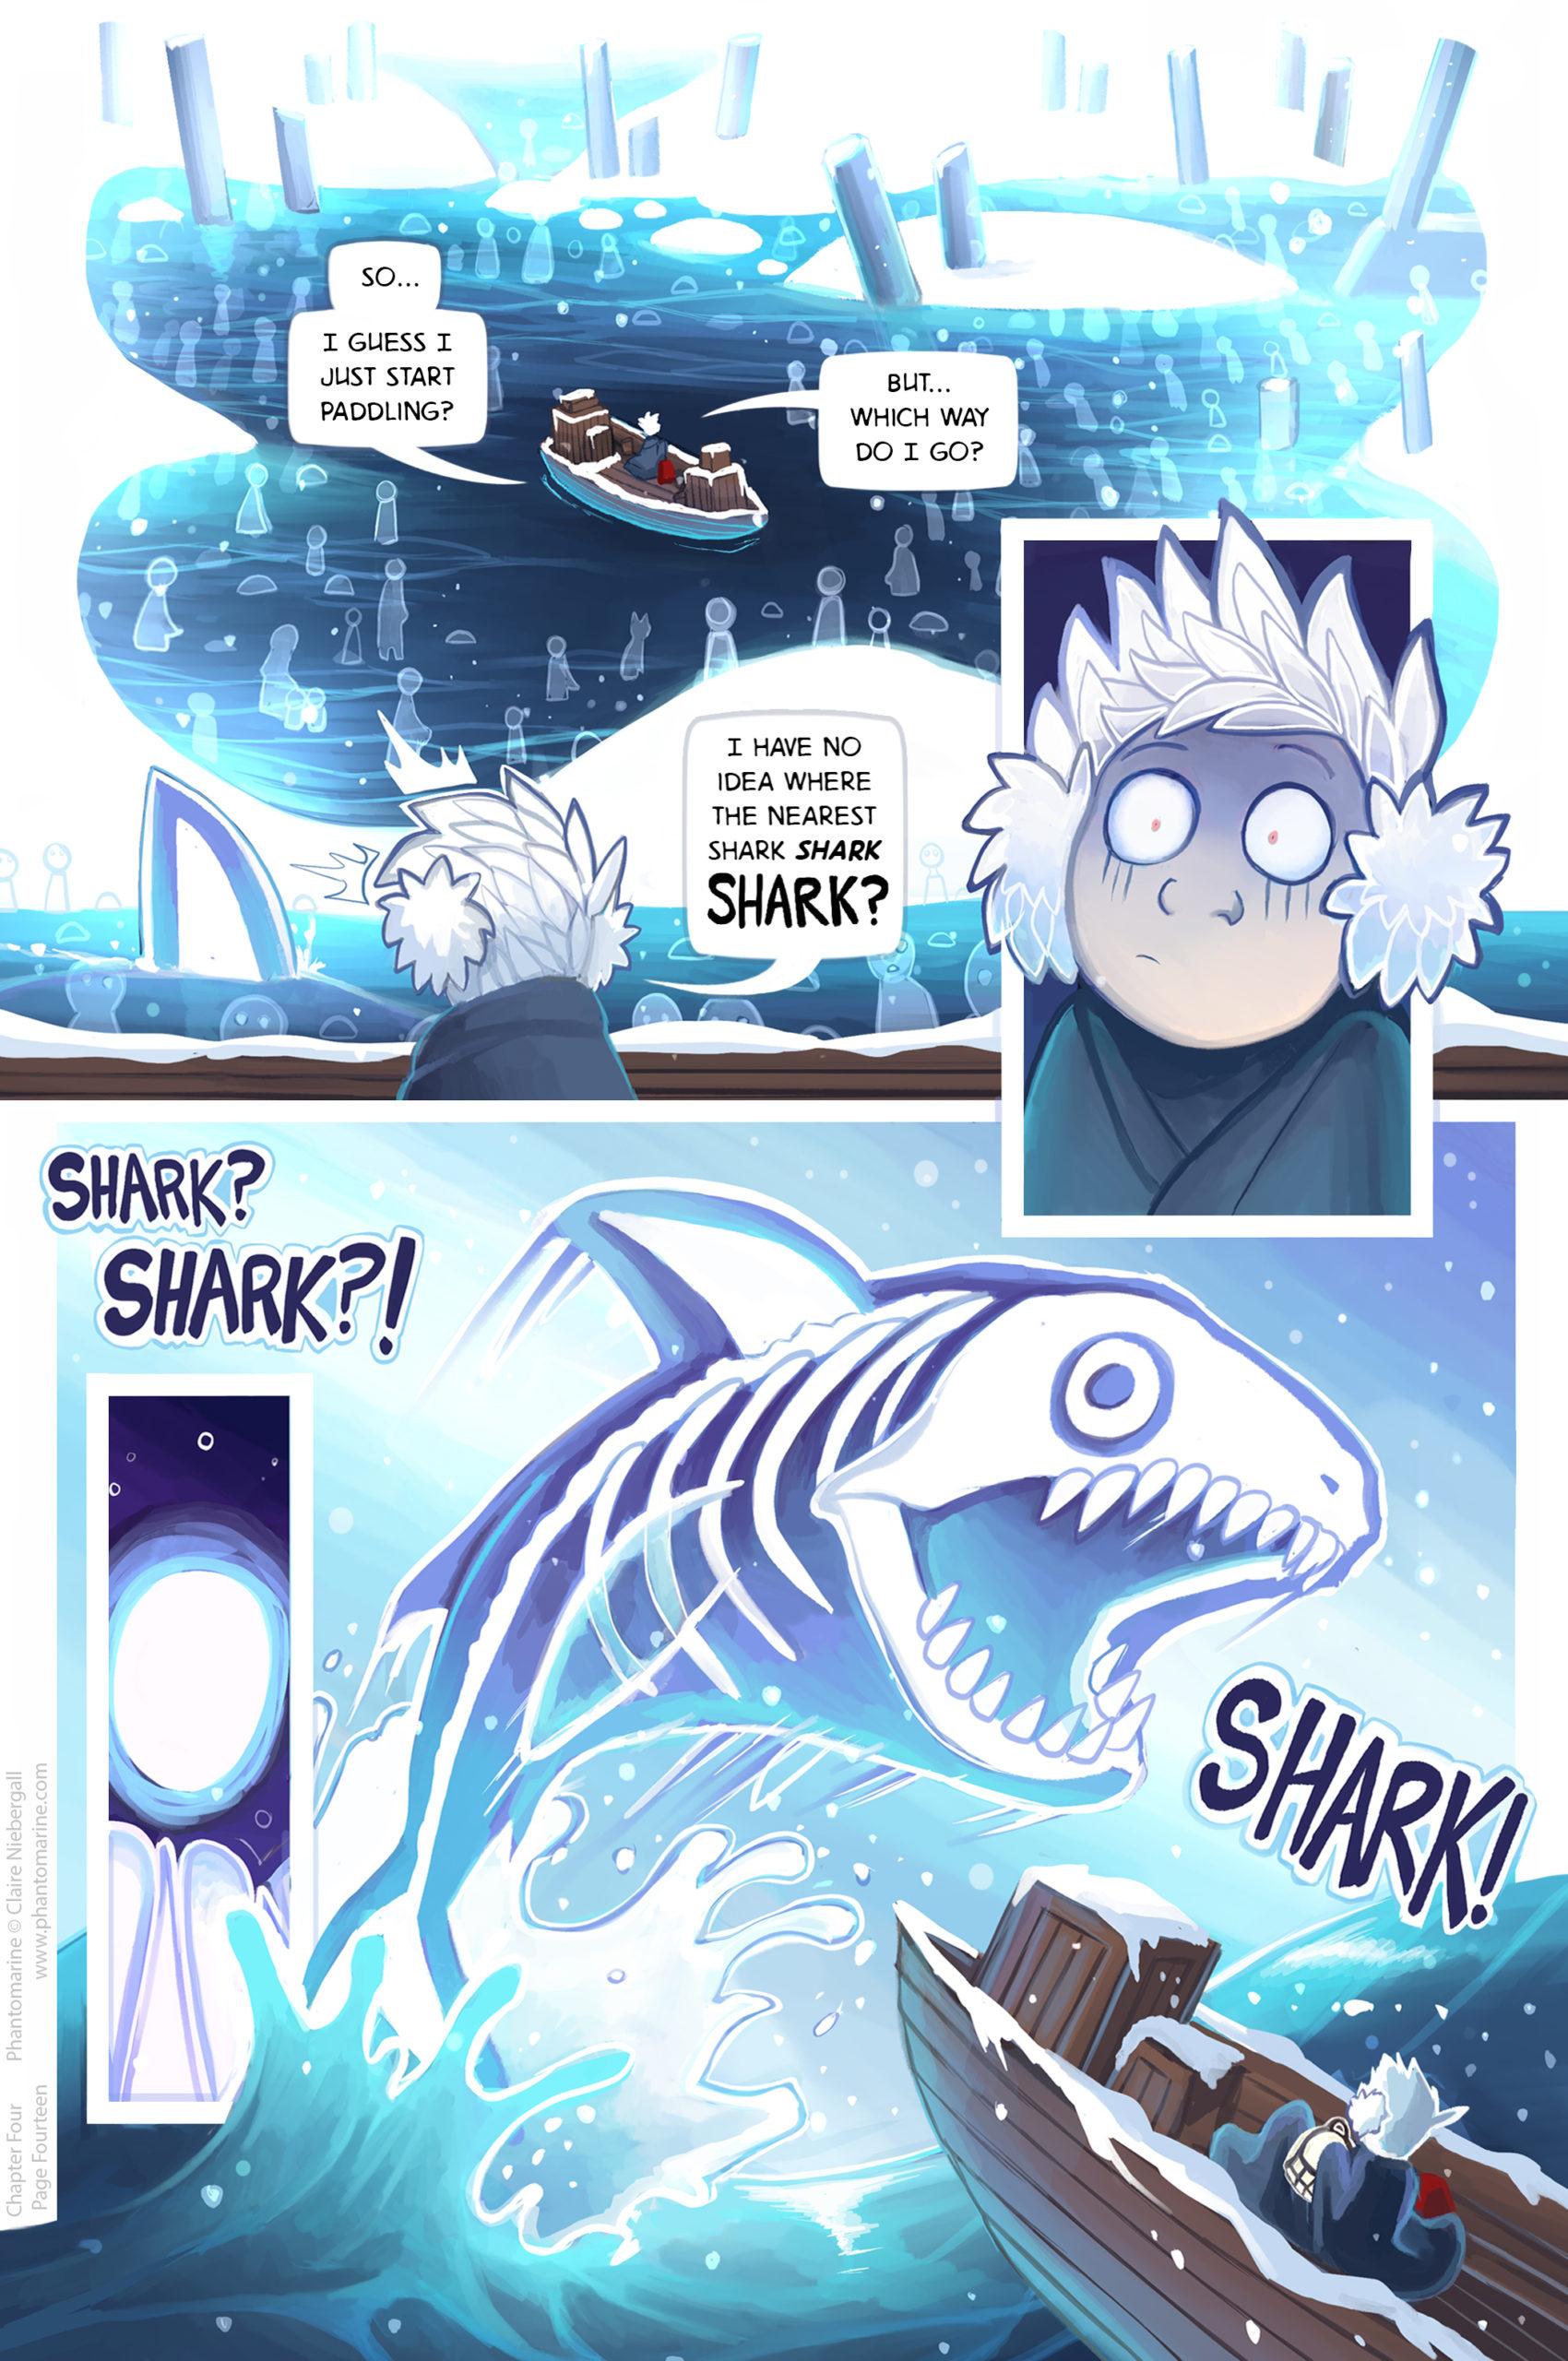 4.14 The Nearest Shark